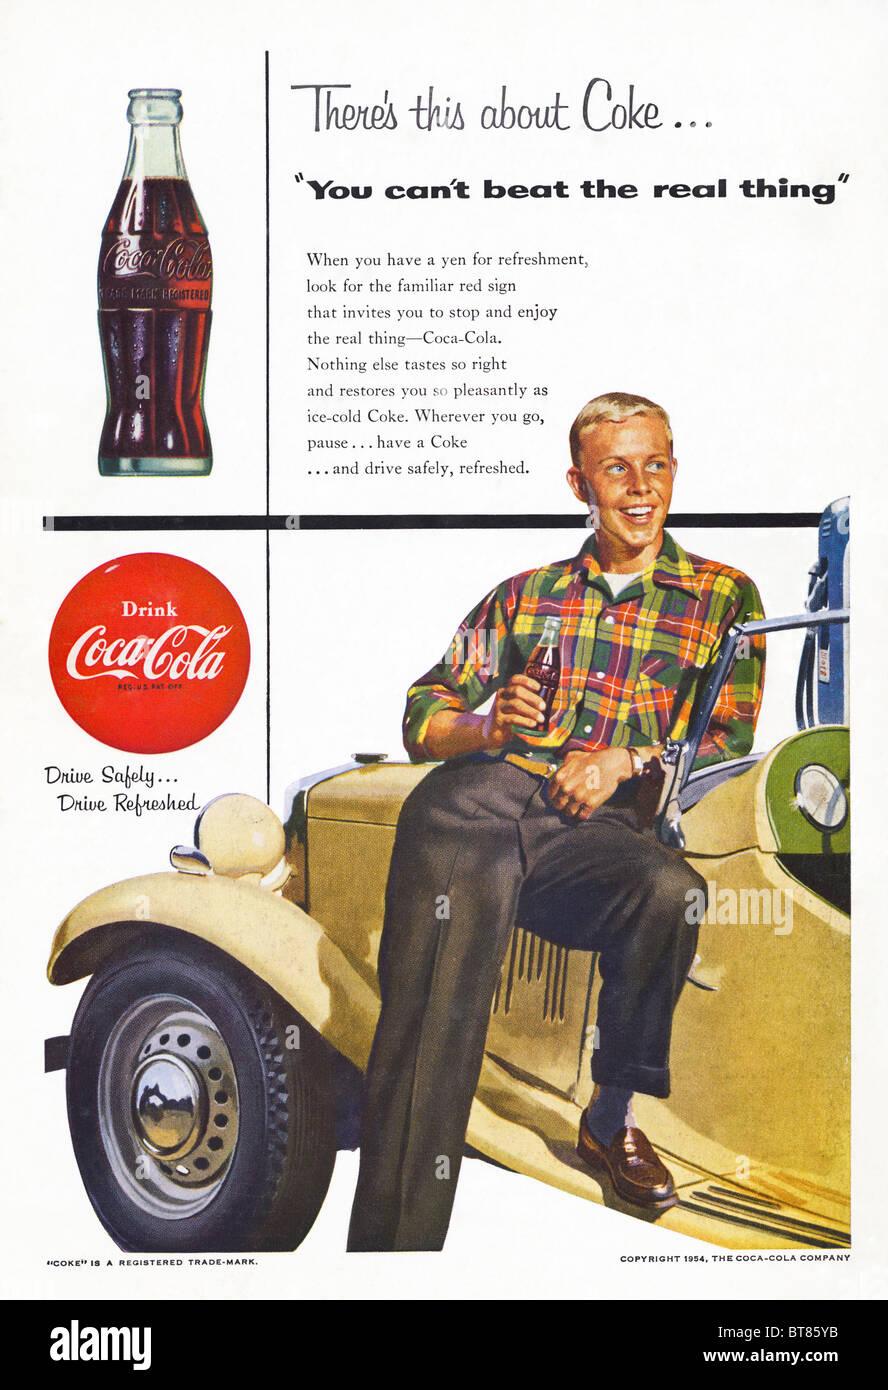 Classic advert in American magazine for Coca-Cola June 1954 - Stock Image